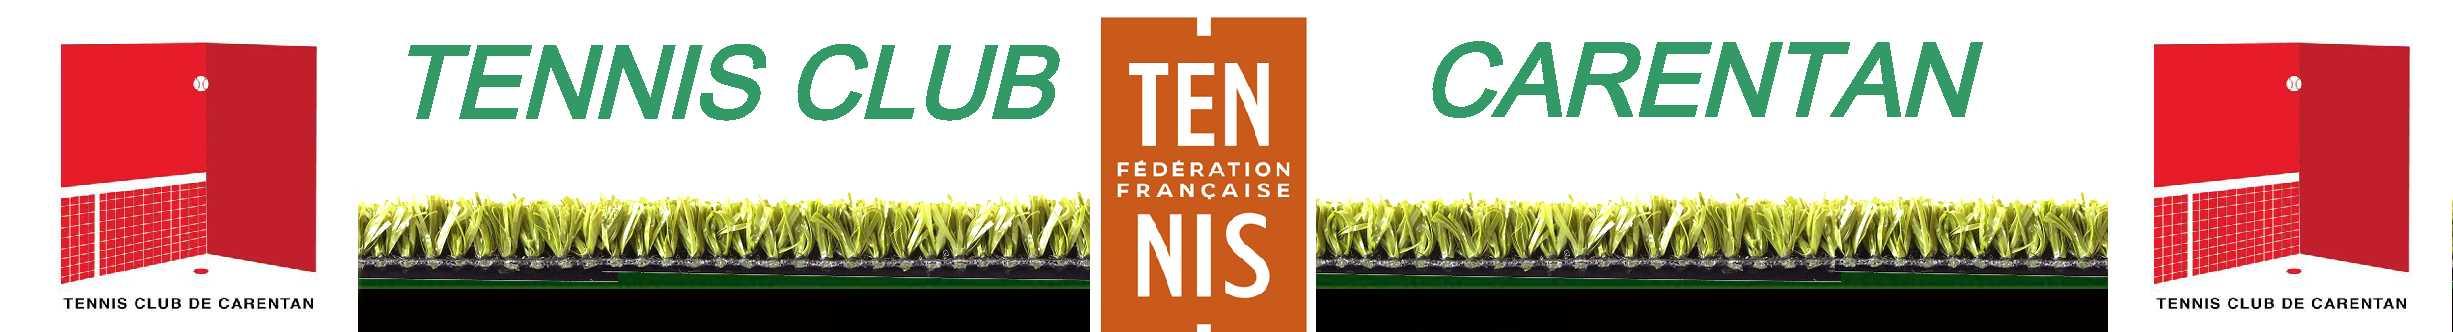 Tennis Club Carentan